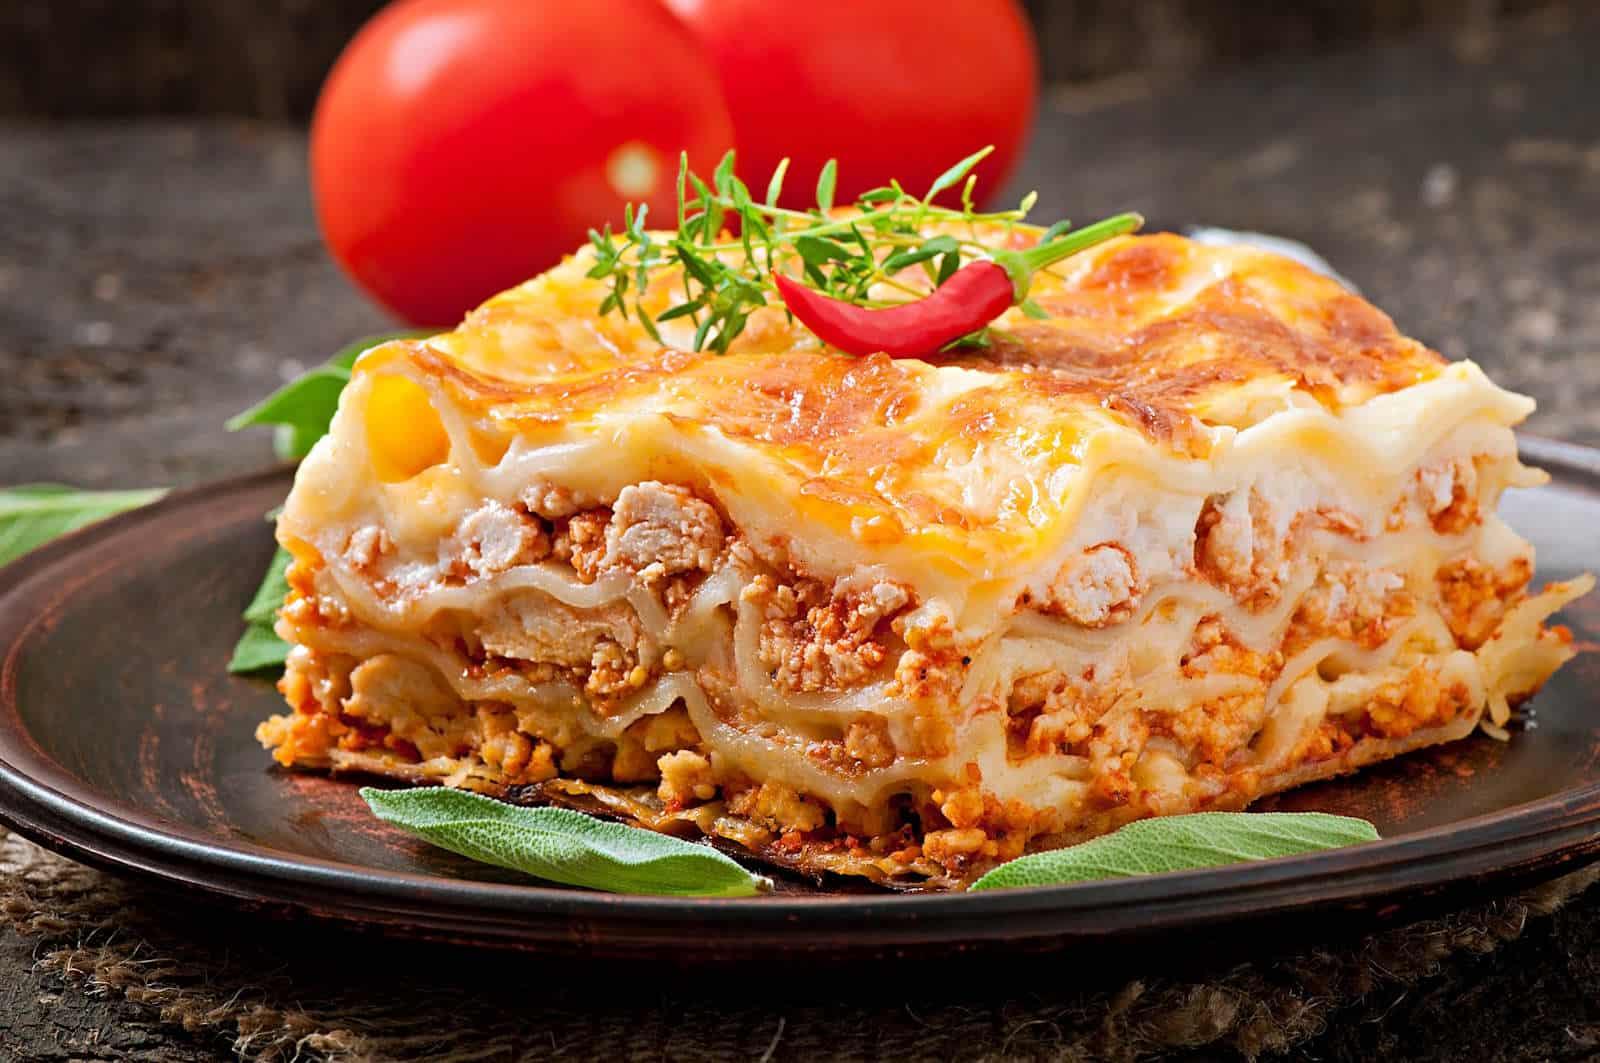 It's Italian Cucina of Austin